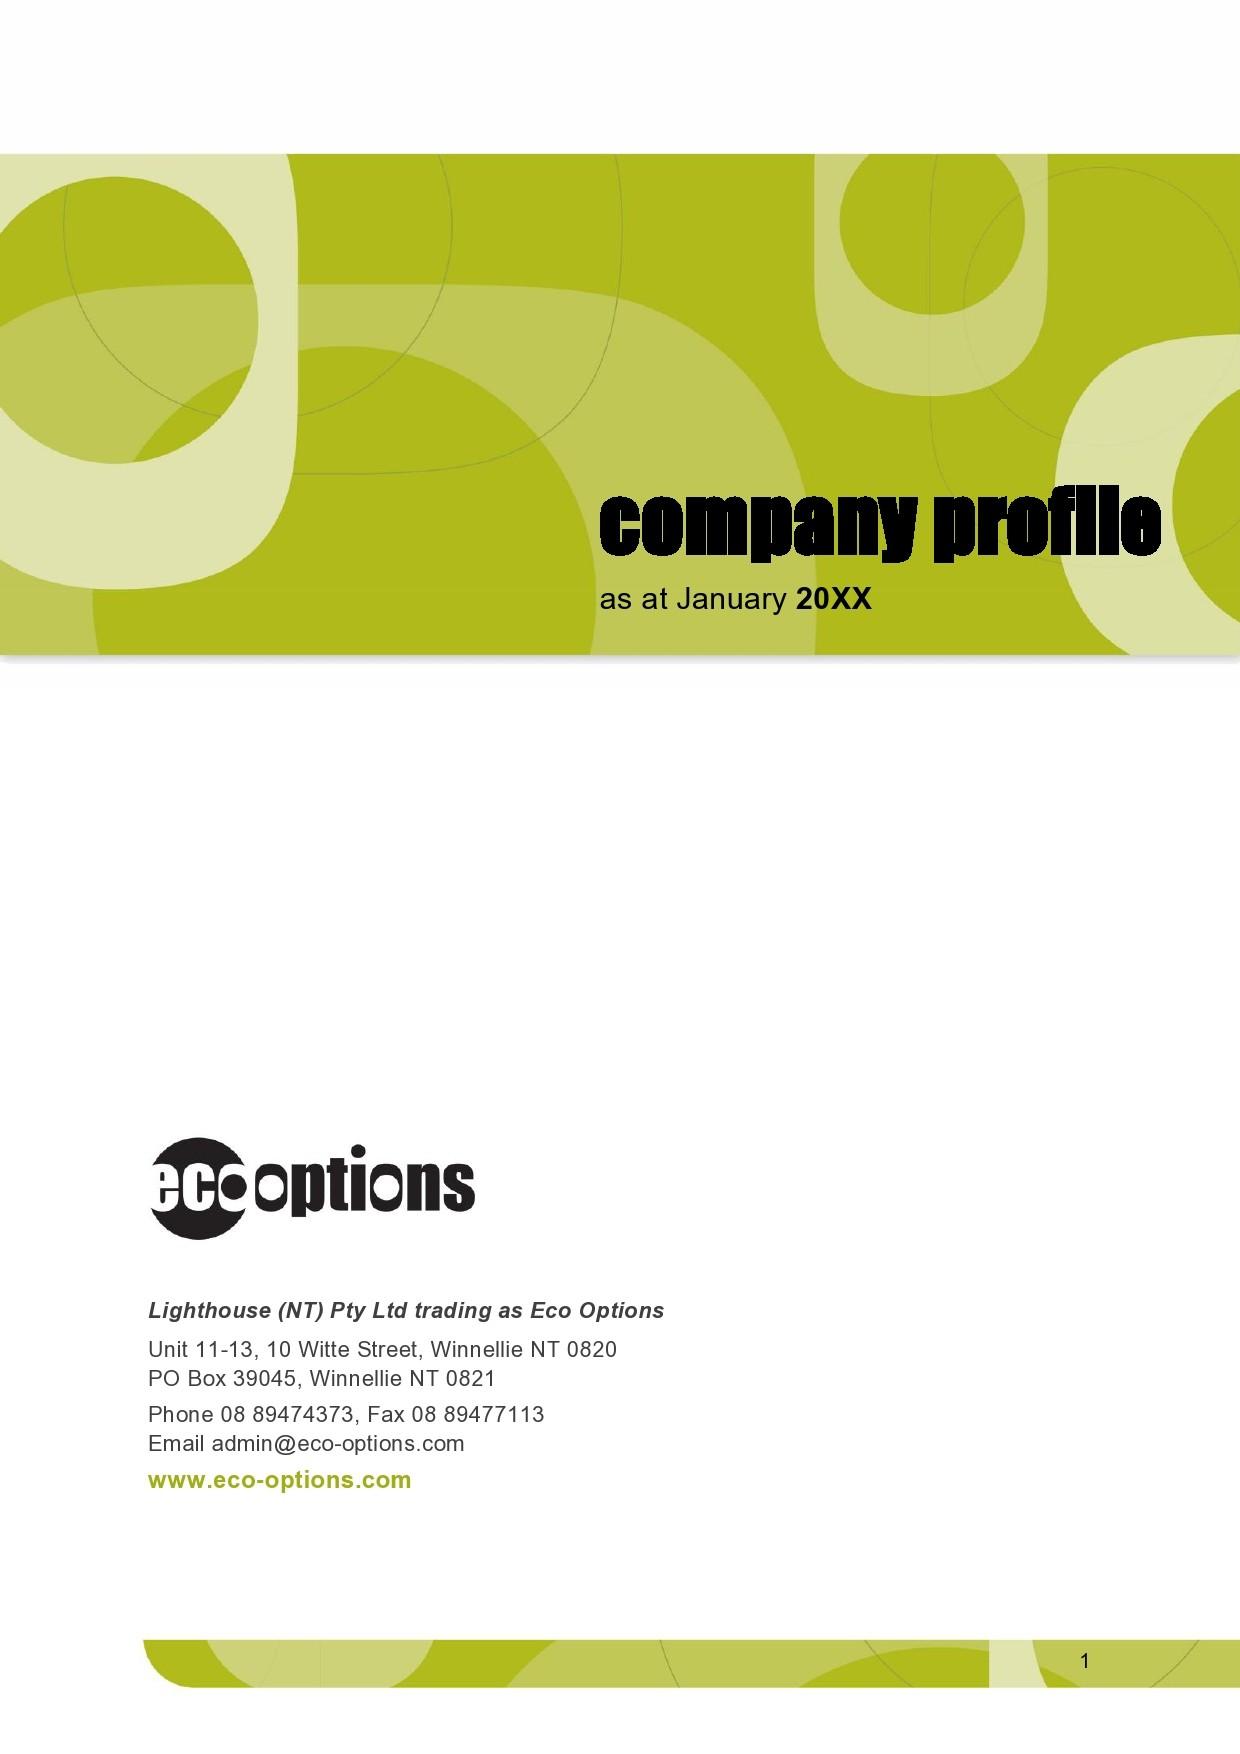 Free company profile template 01